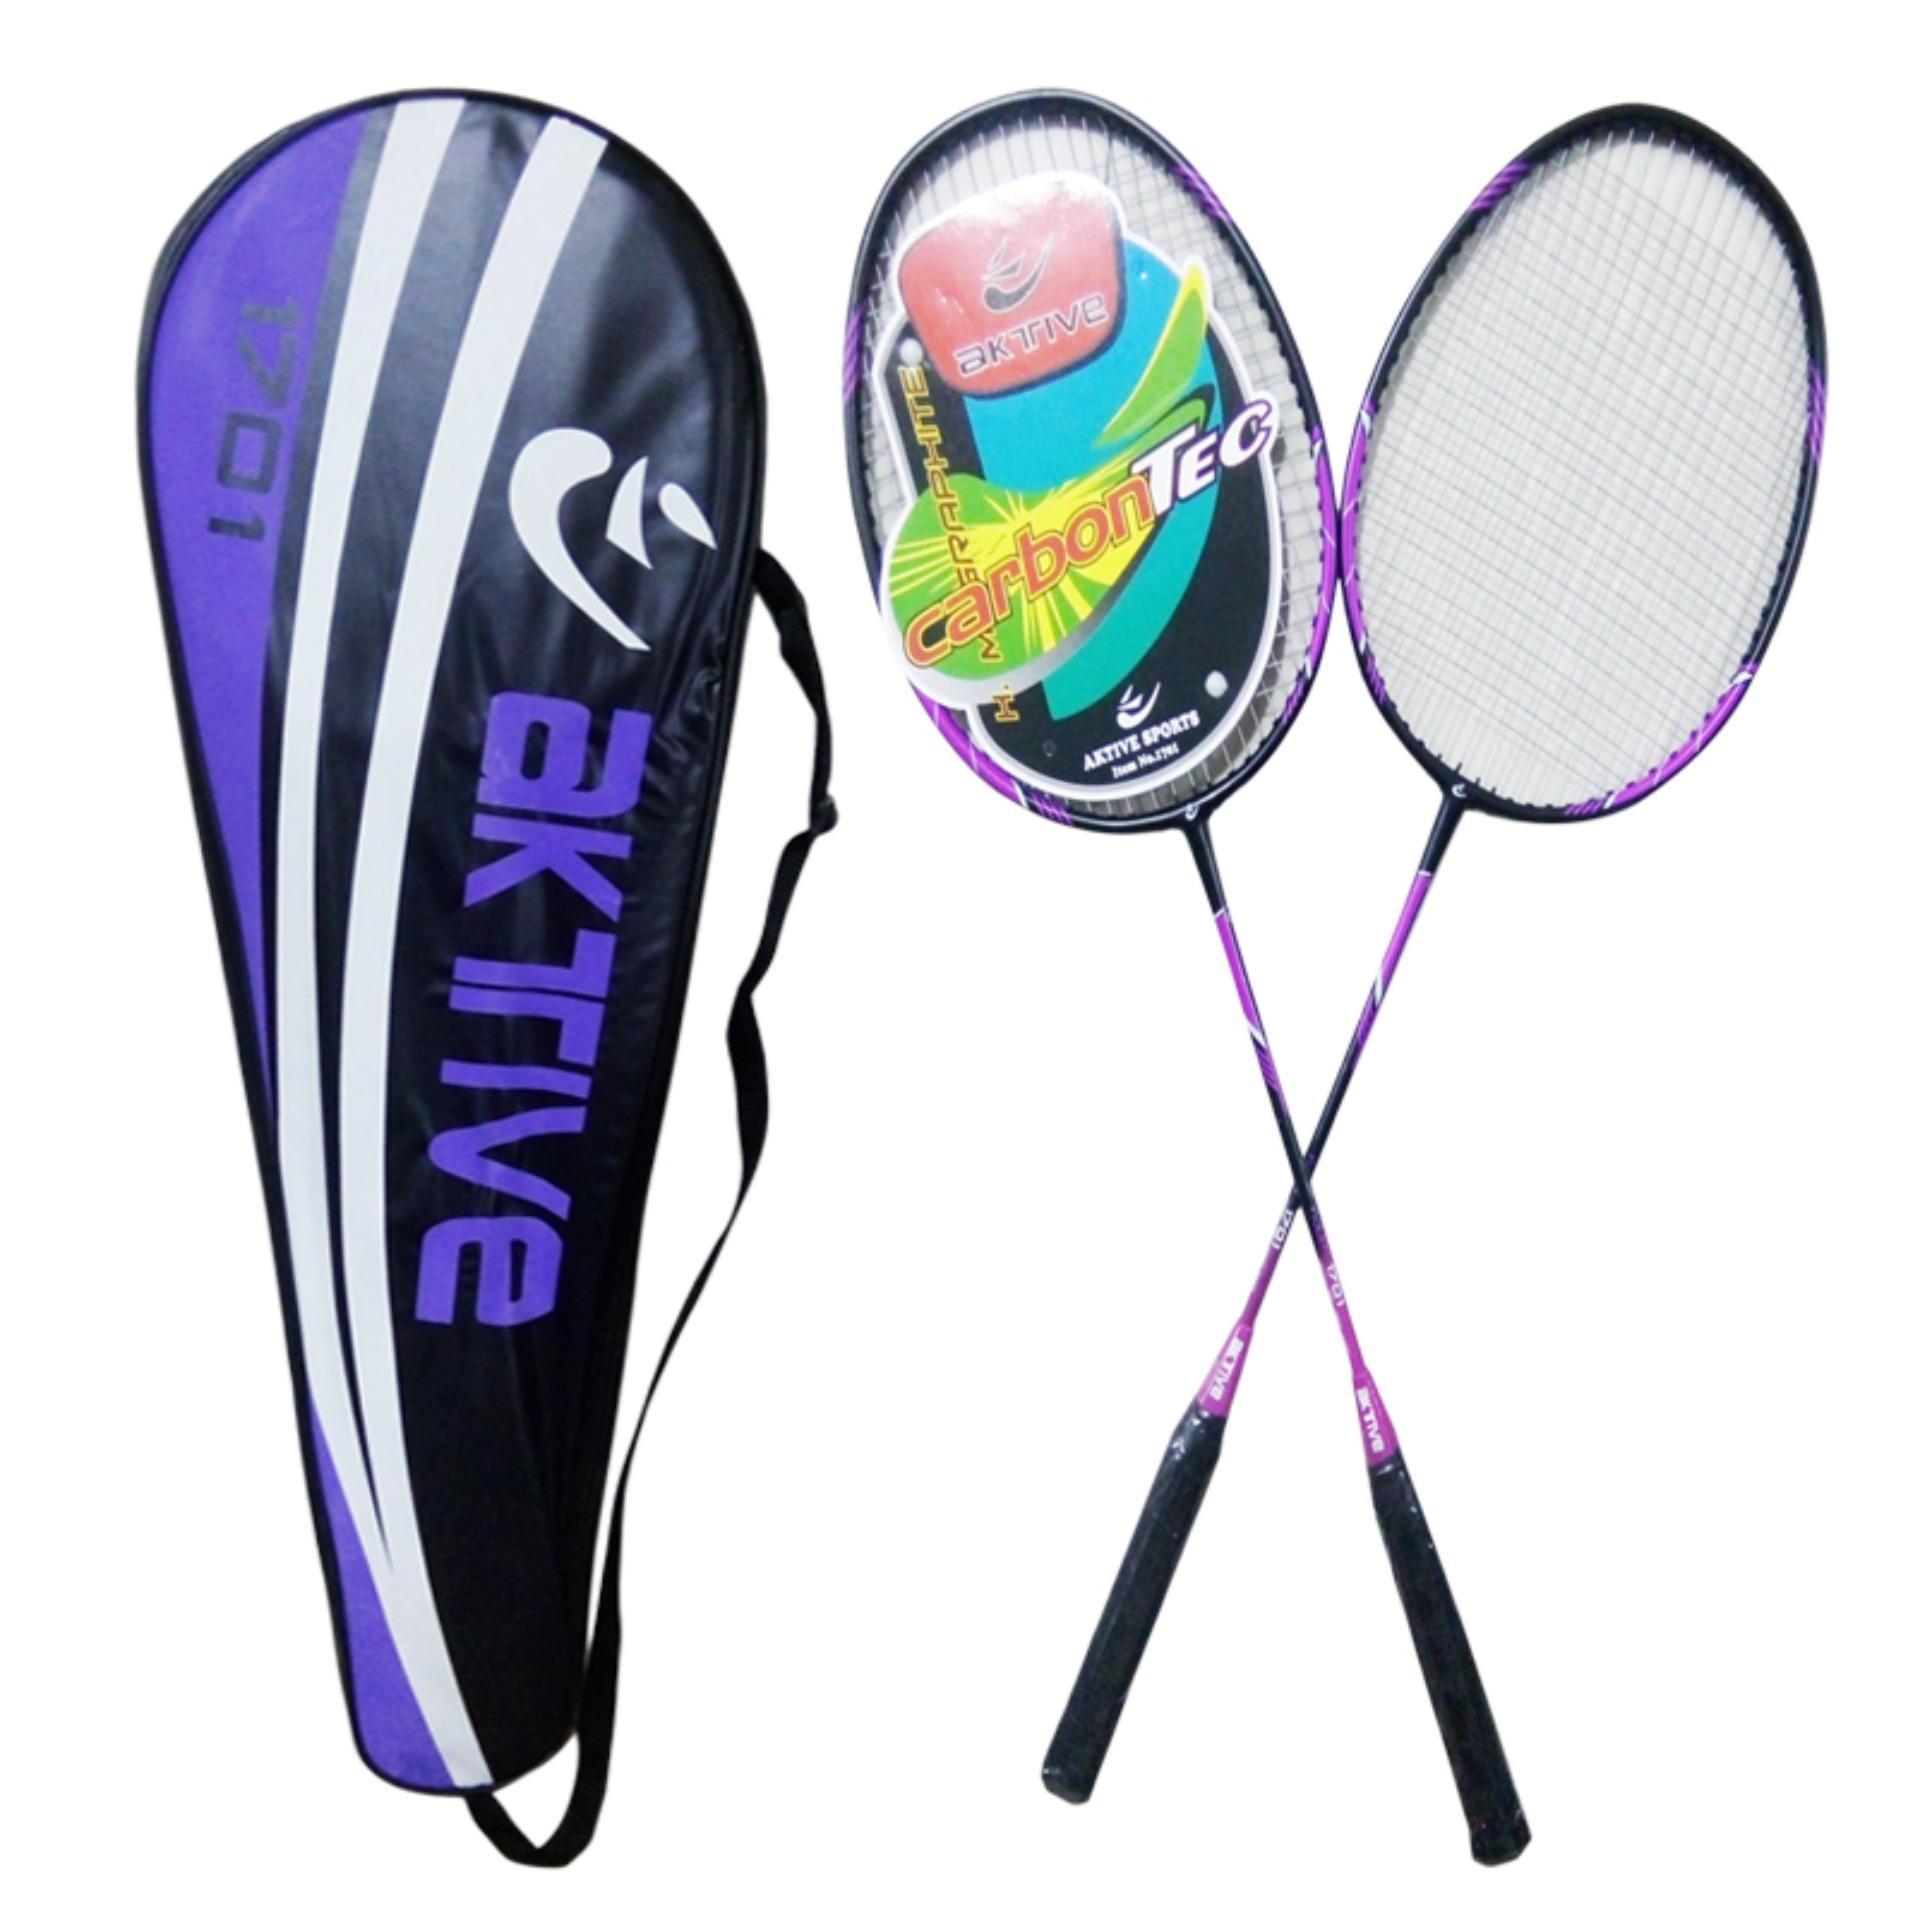 Aktive Badminton Racket 1701 Set of 2 (purple)